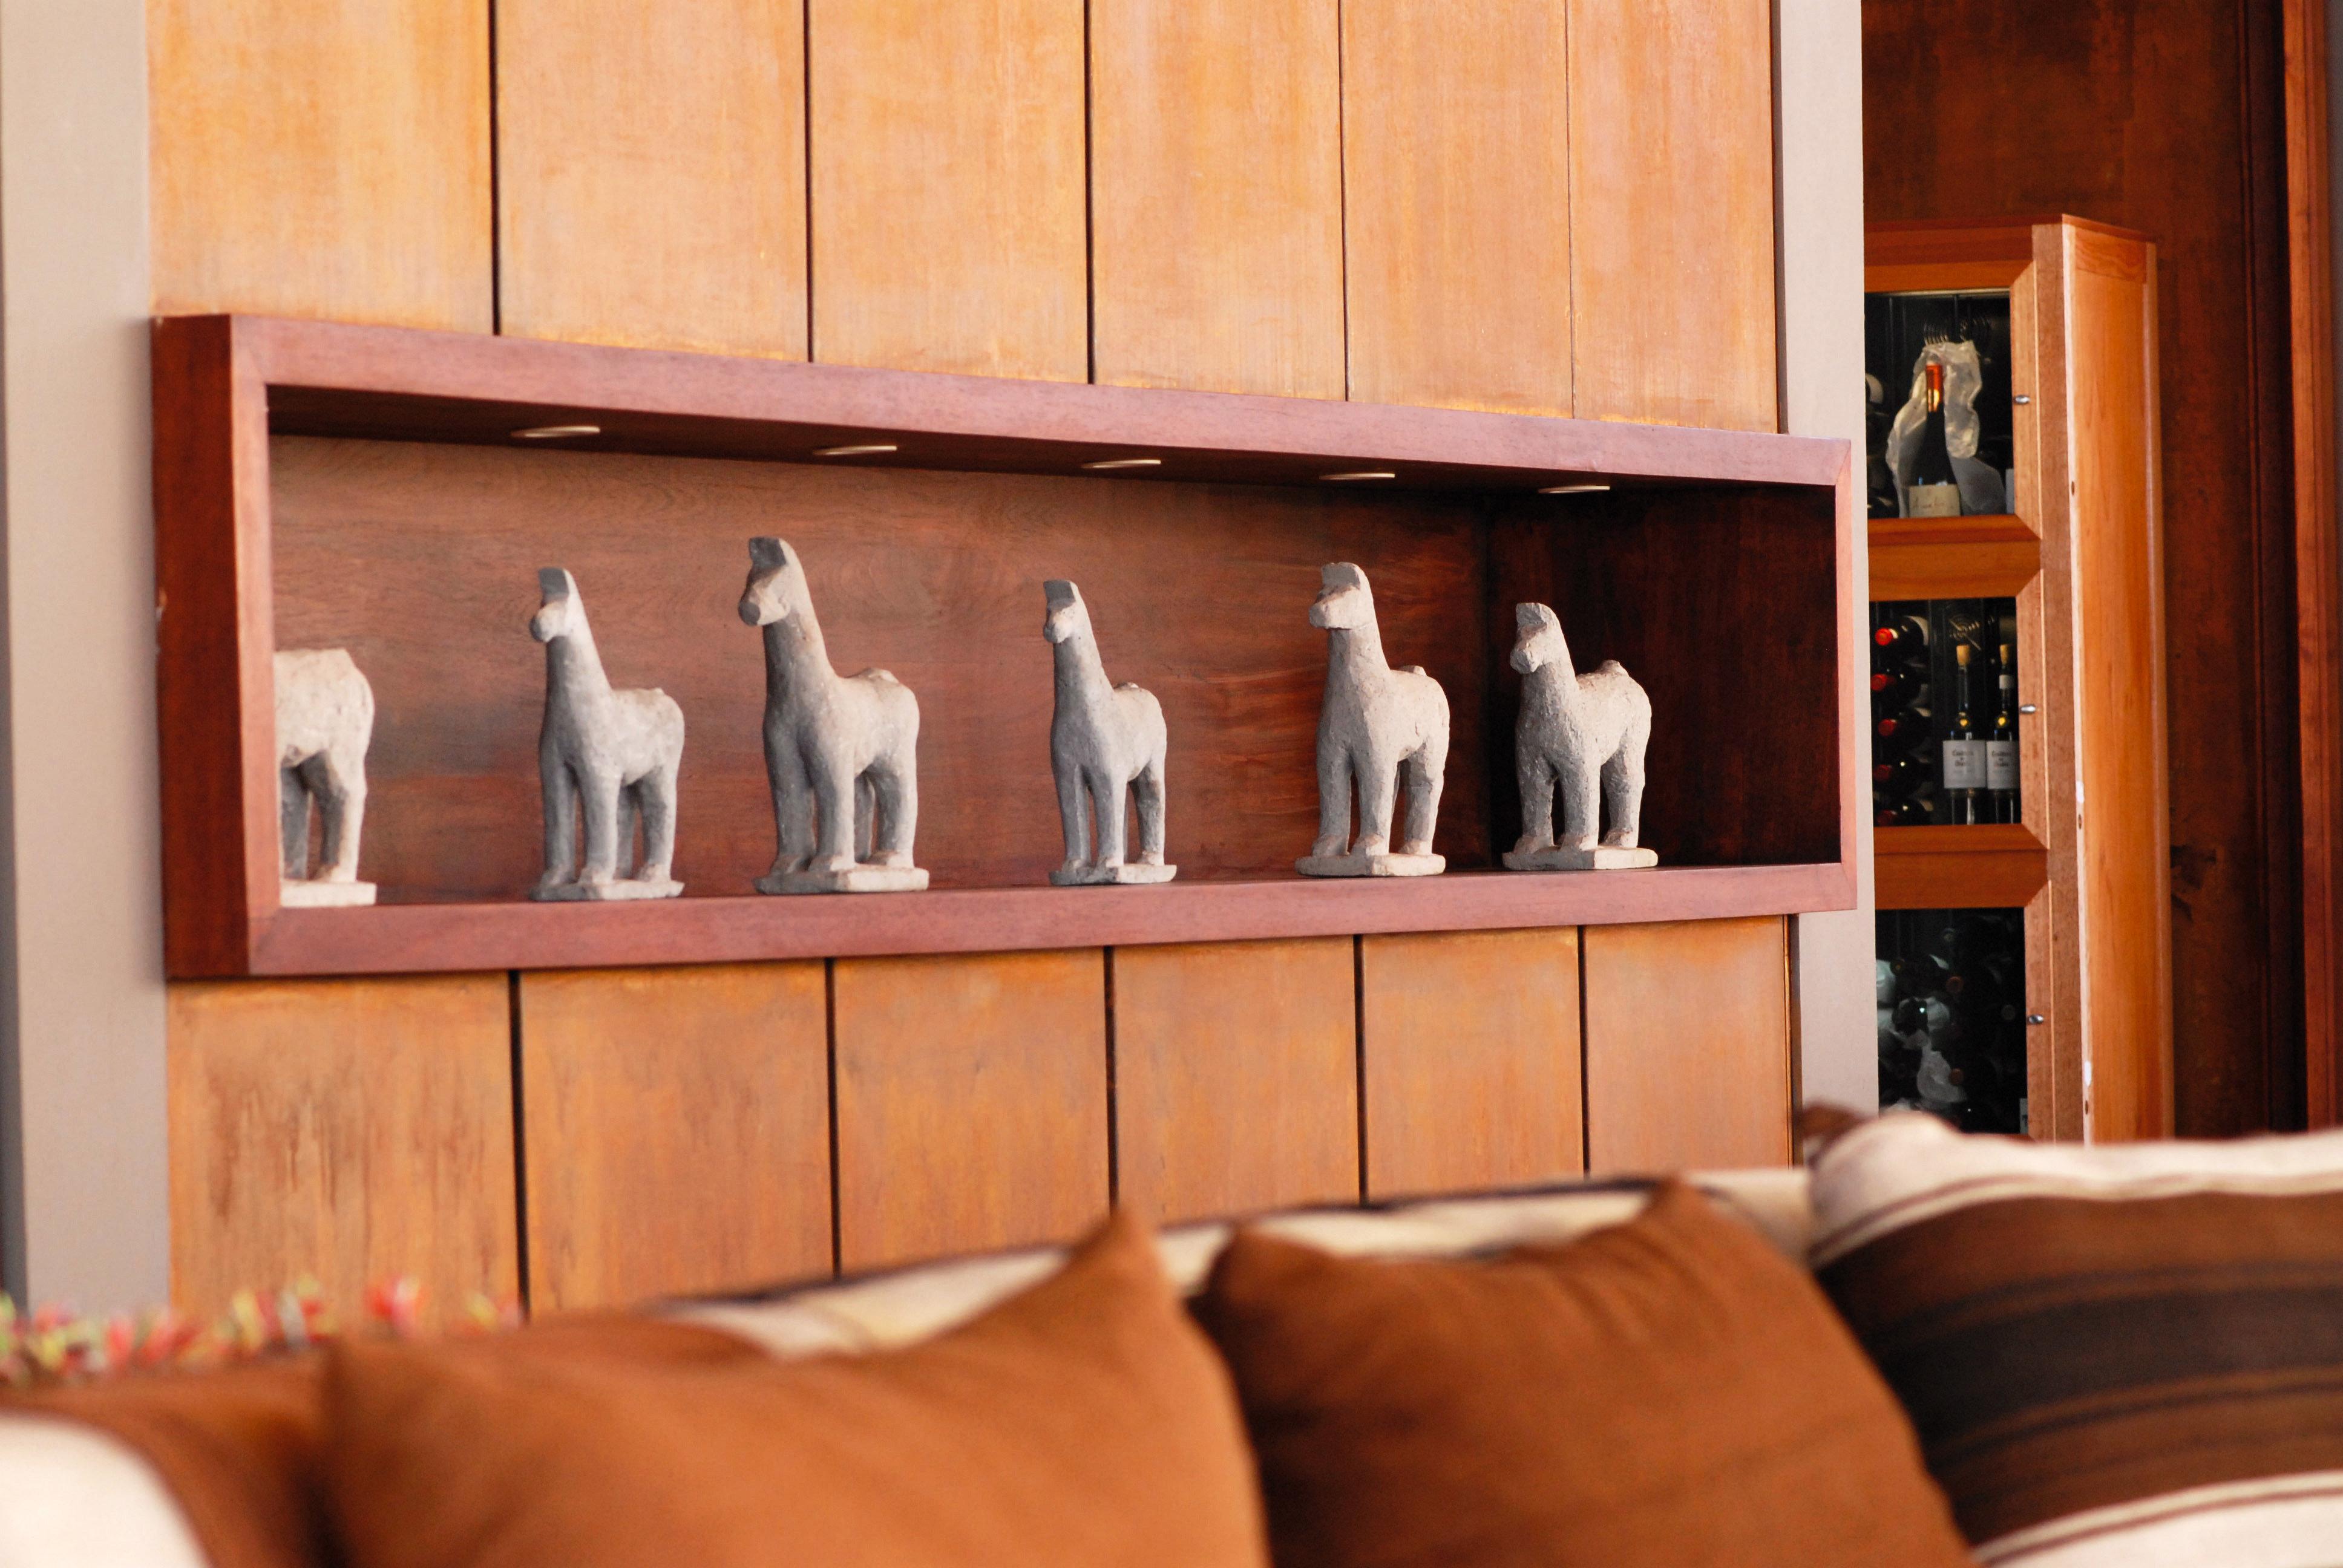 Lounge Luxury Scenic views cabinet cabinetry living room home hardwood shelf shelving